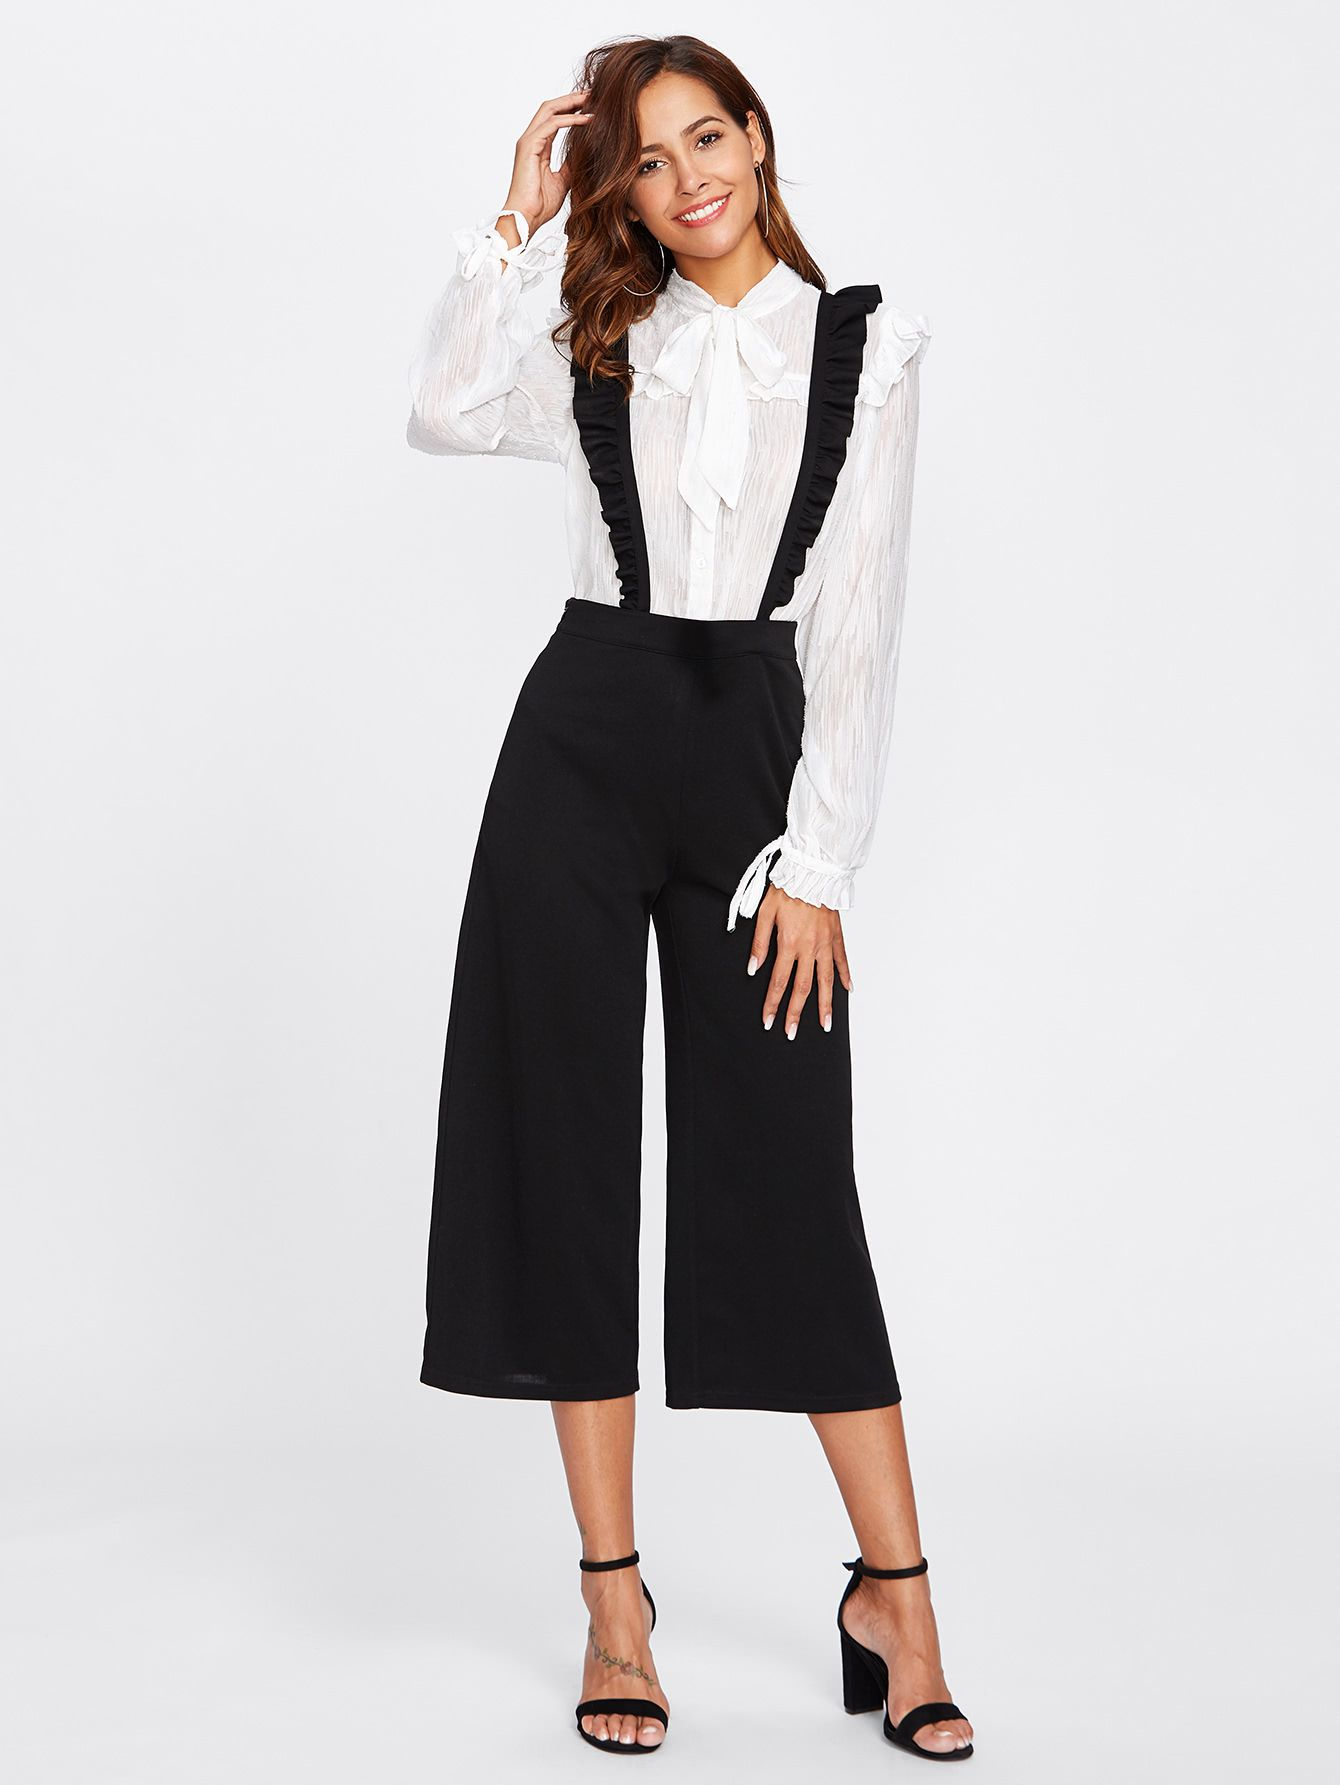 ac025e907832 Shop Crisscross Frill Strap Culotte Pants online. SheIn offers Crisscross  Frill Strap Culotte Pants   more to fit your fashionable needs.